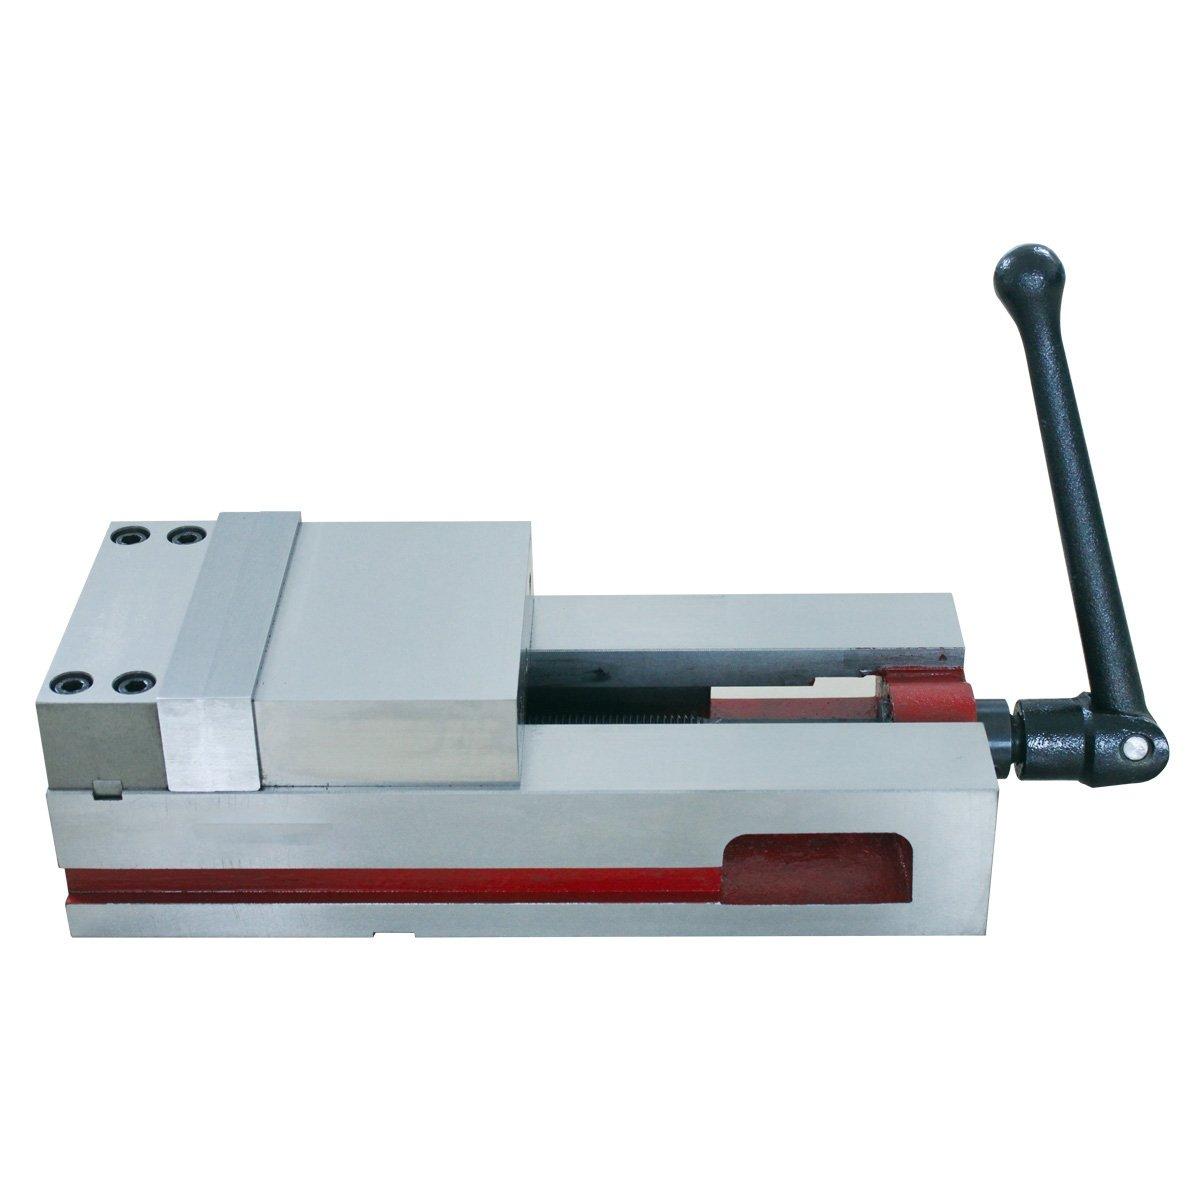 HHIP 3900-0171 5 Super-Lock Vise for NC//CNC Machines 13.19 13.19 ABS Import Tools Inc.